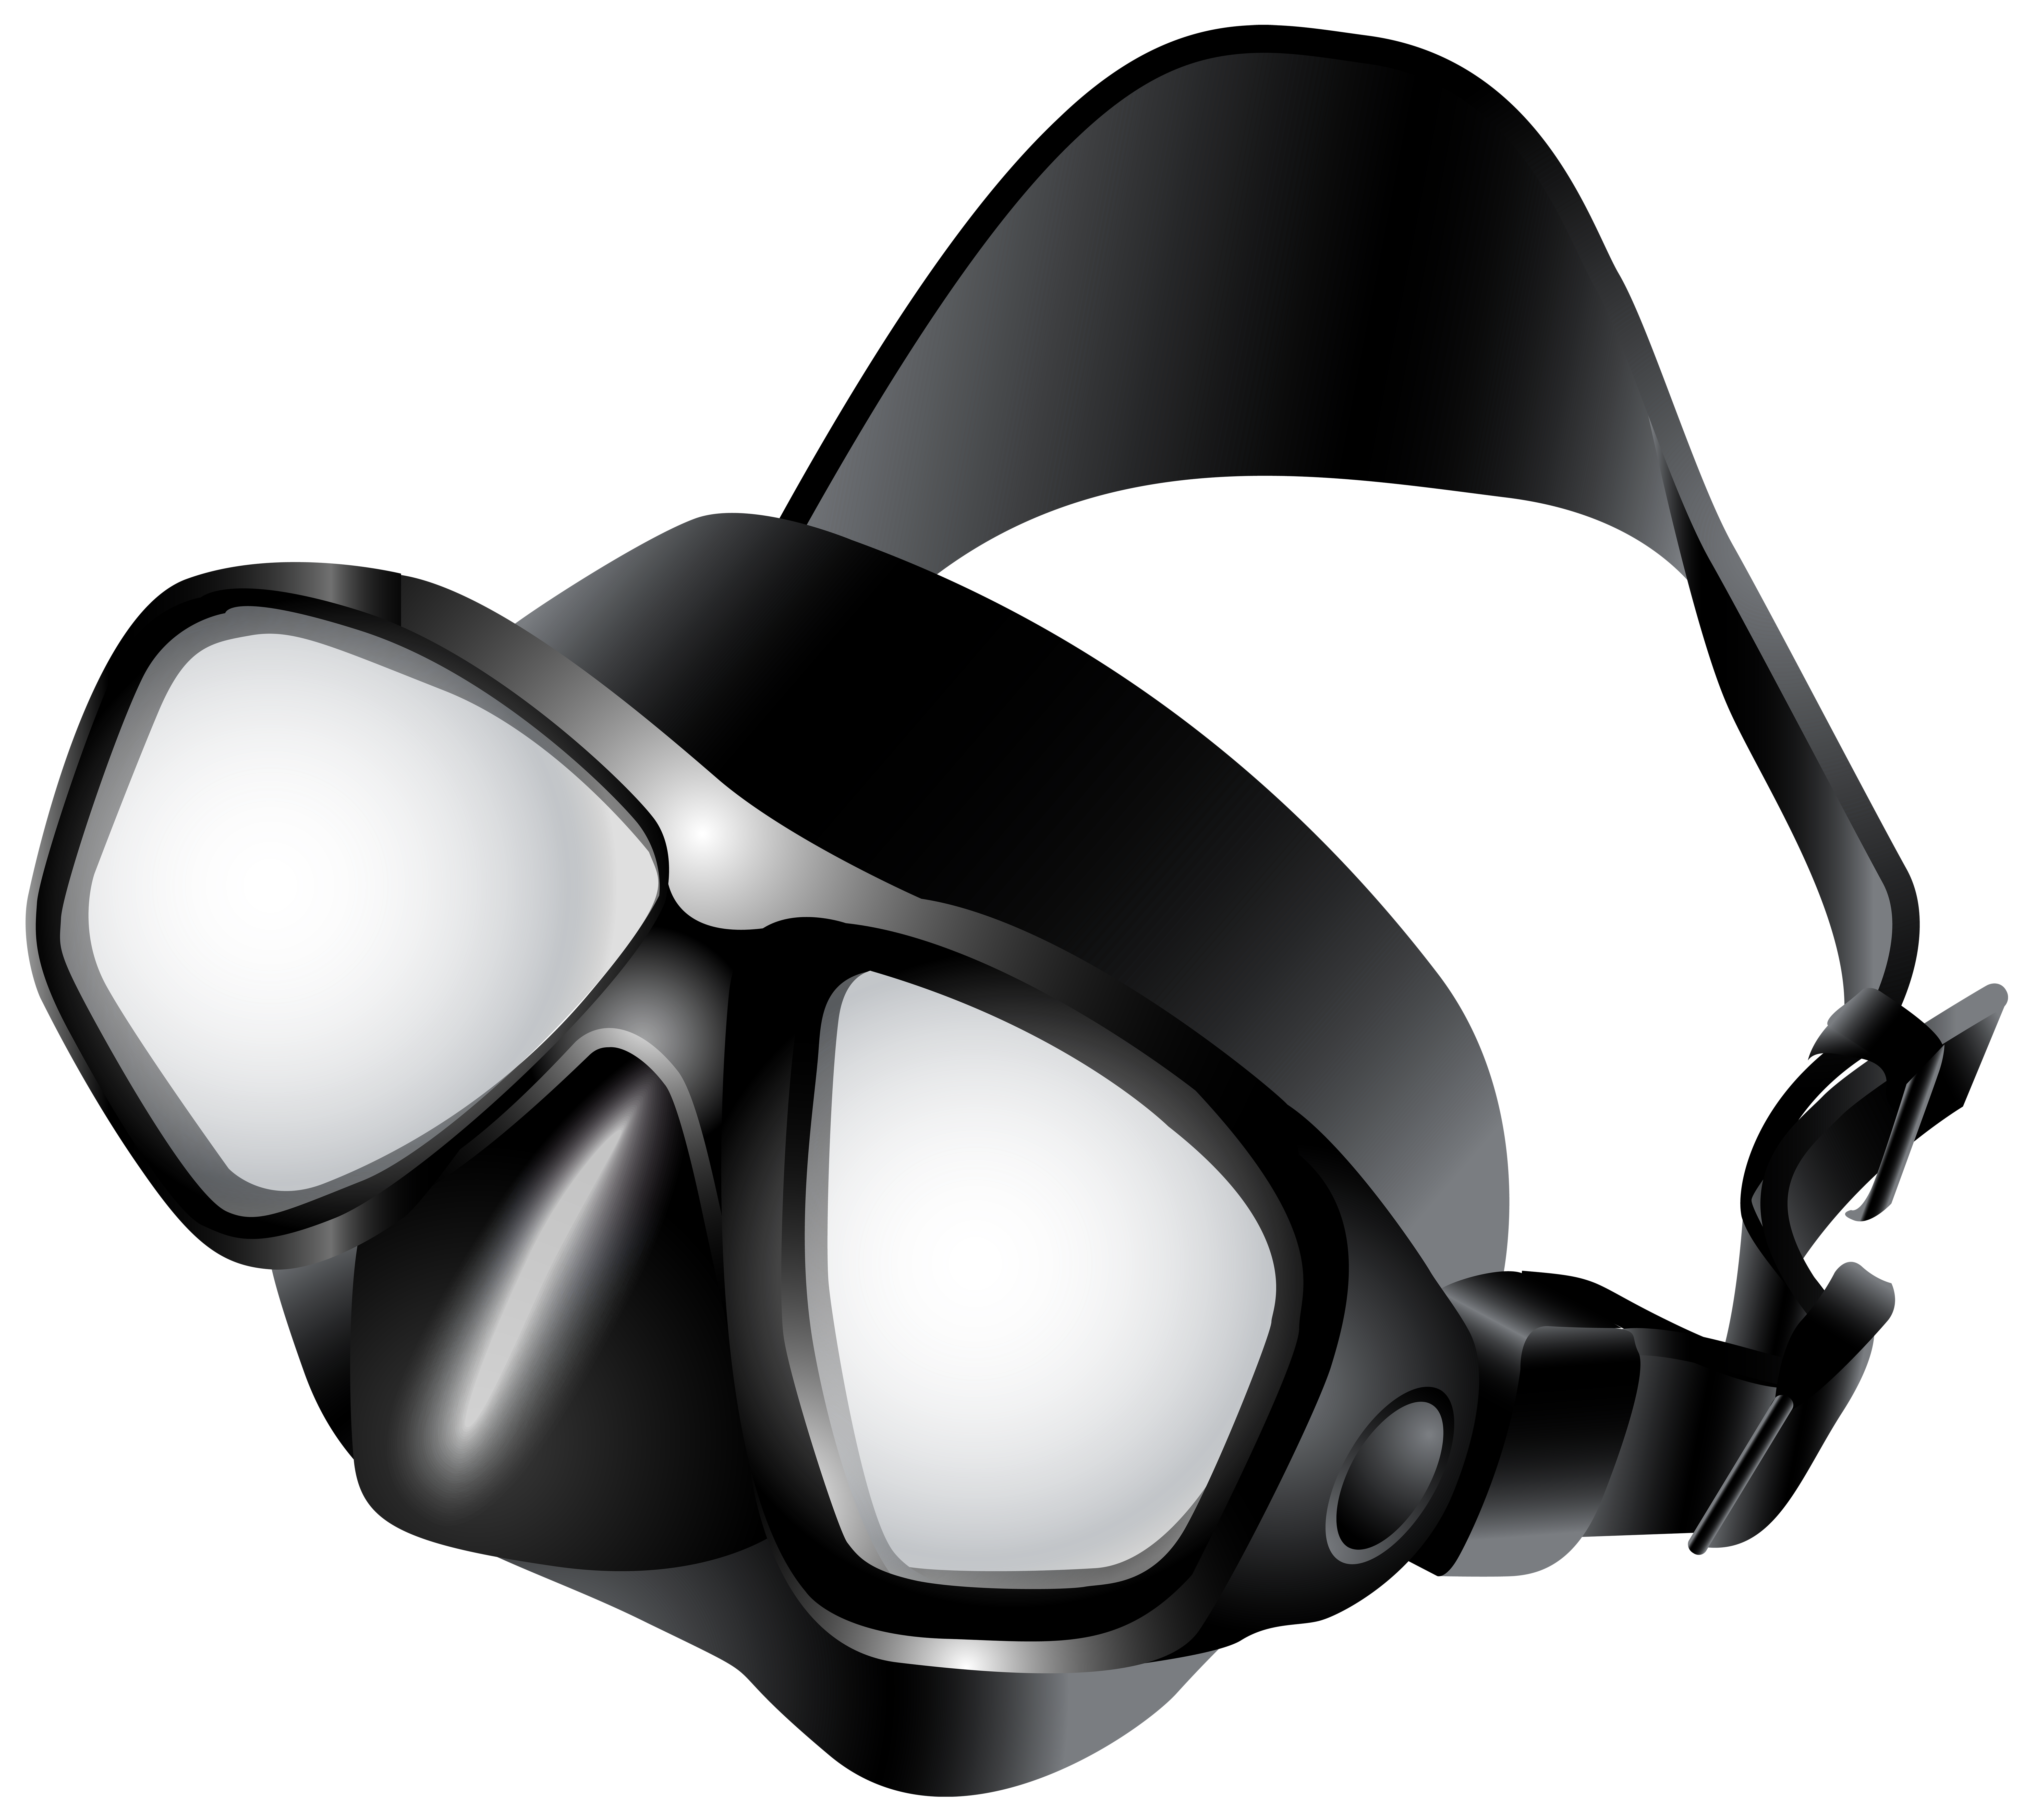 Diver clipart scuba gear. Dive mask png clip